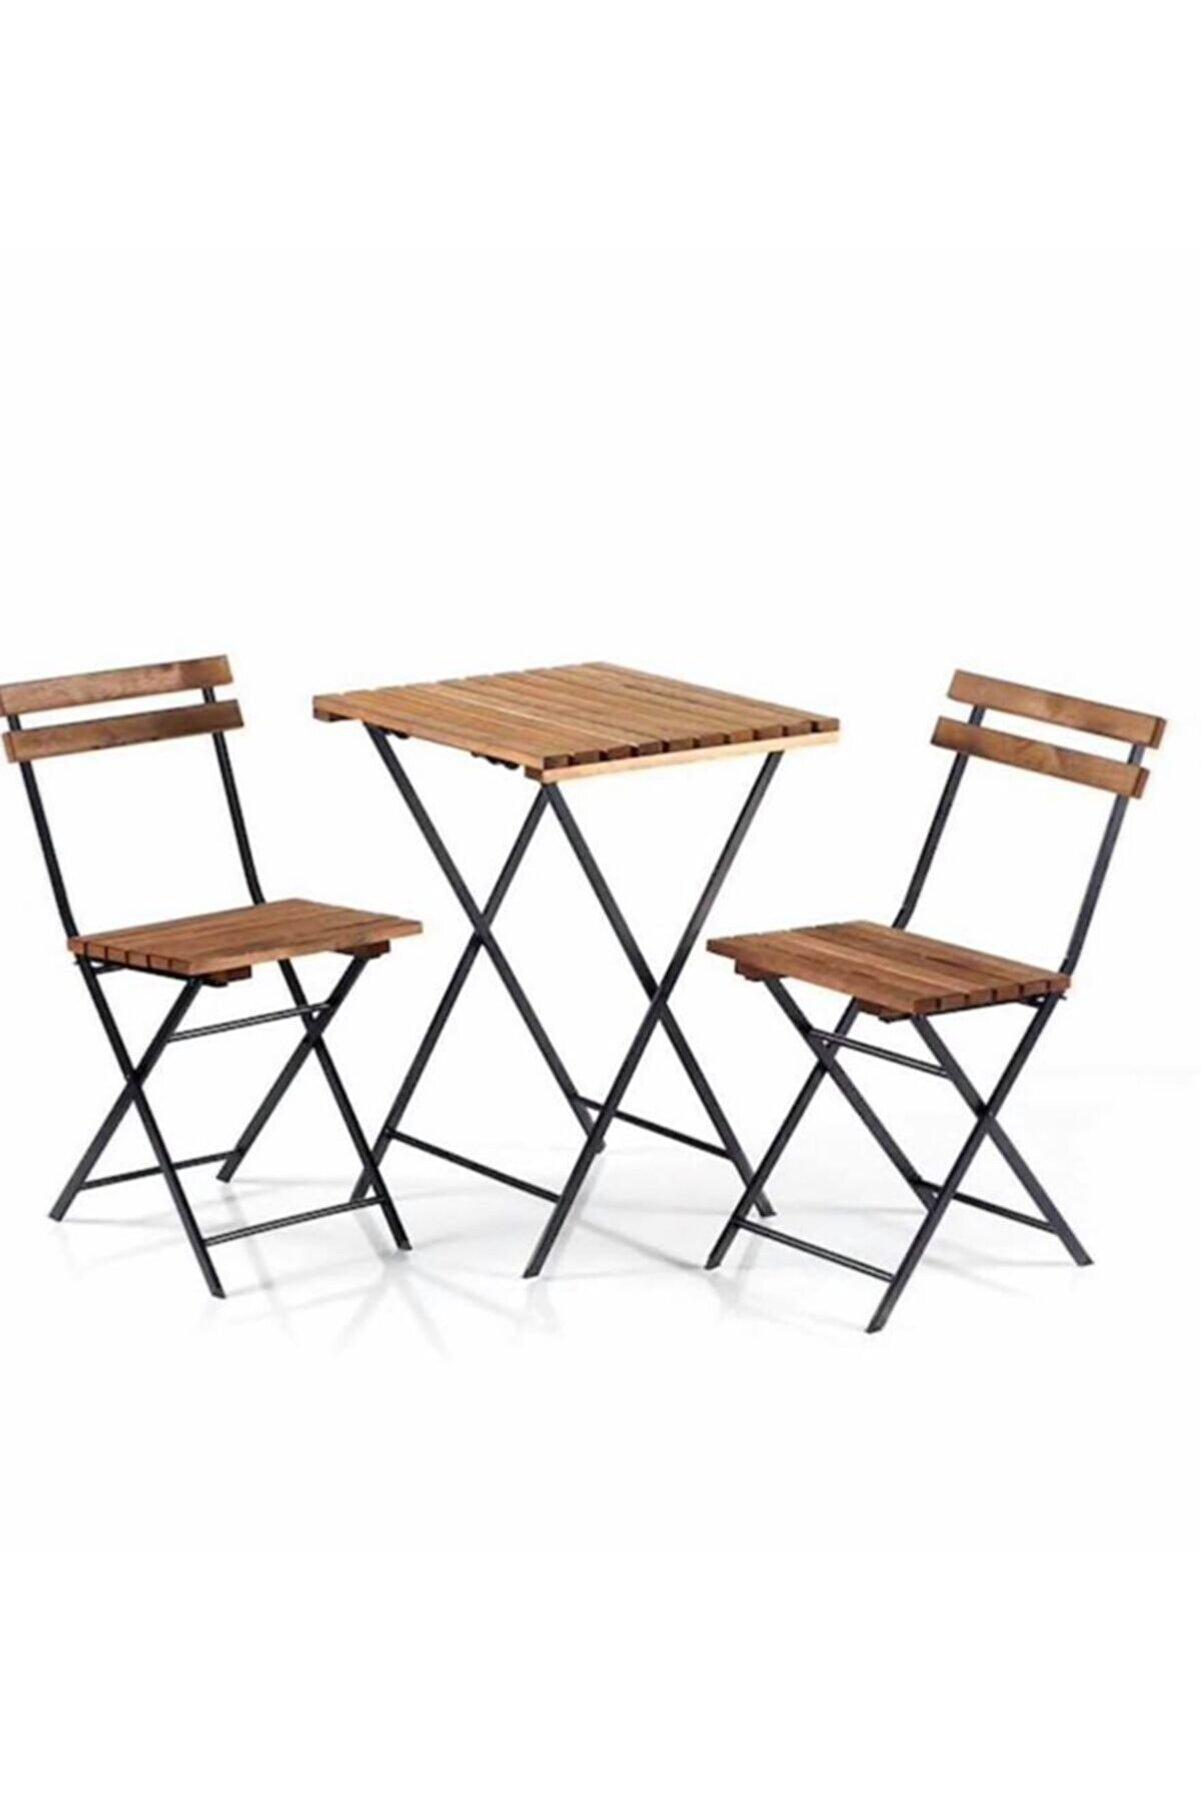 Cosargroup Ikea Model Bistro Seti Bahçe Masa Sandalye Seti 2sandalye 1masa